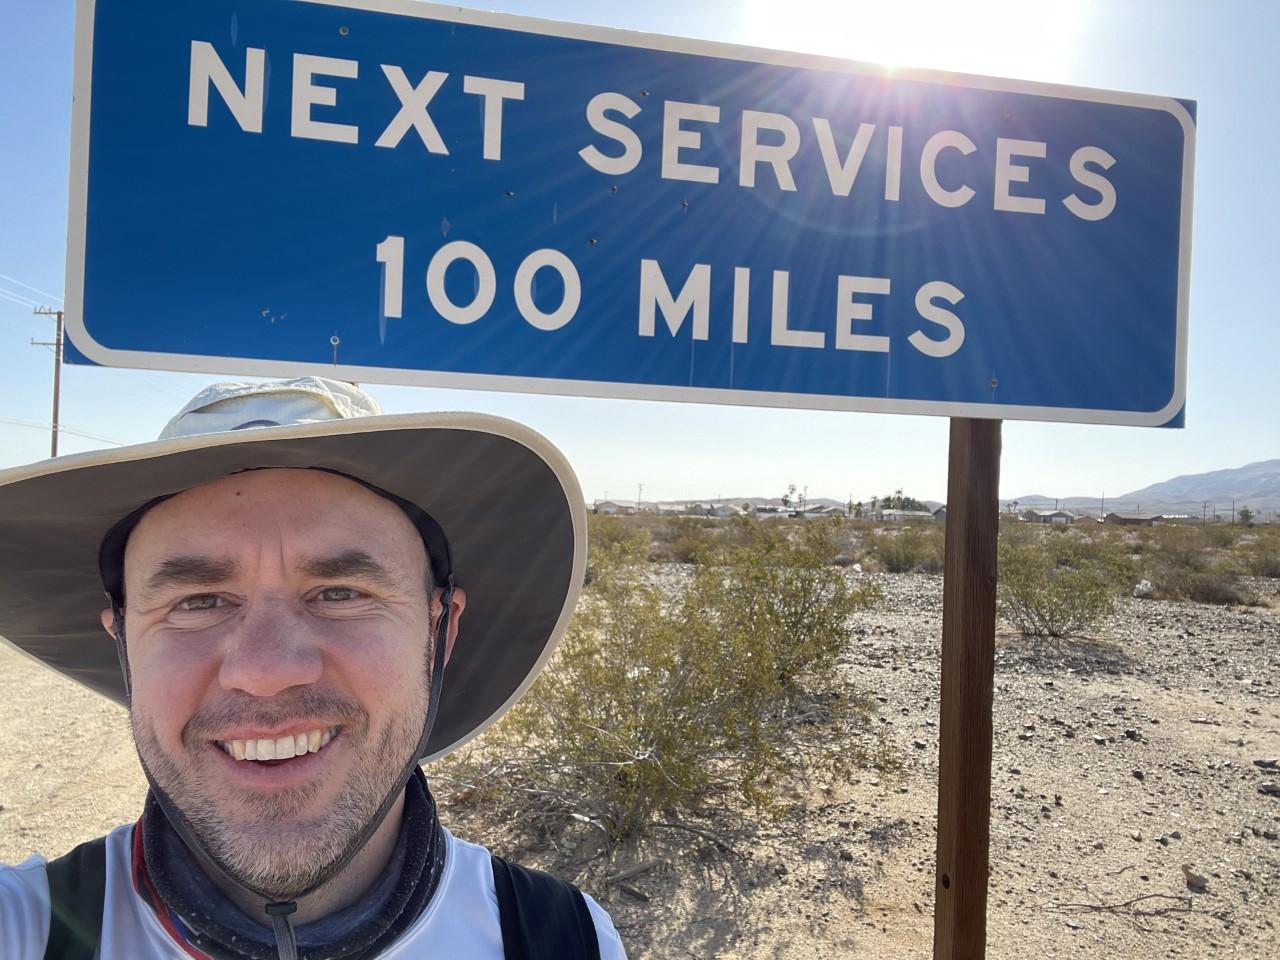 DC teacher runs cross country for cancer research - WDVM 25